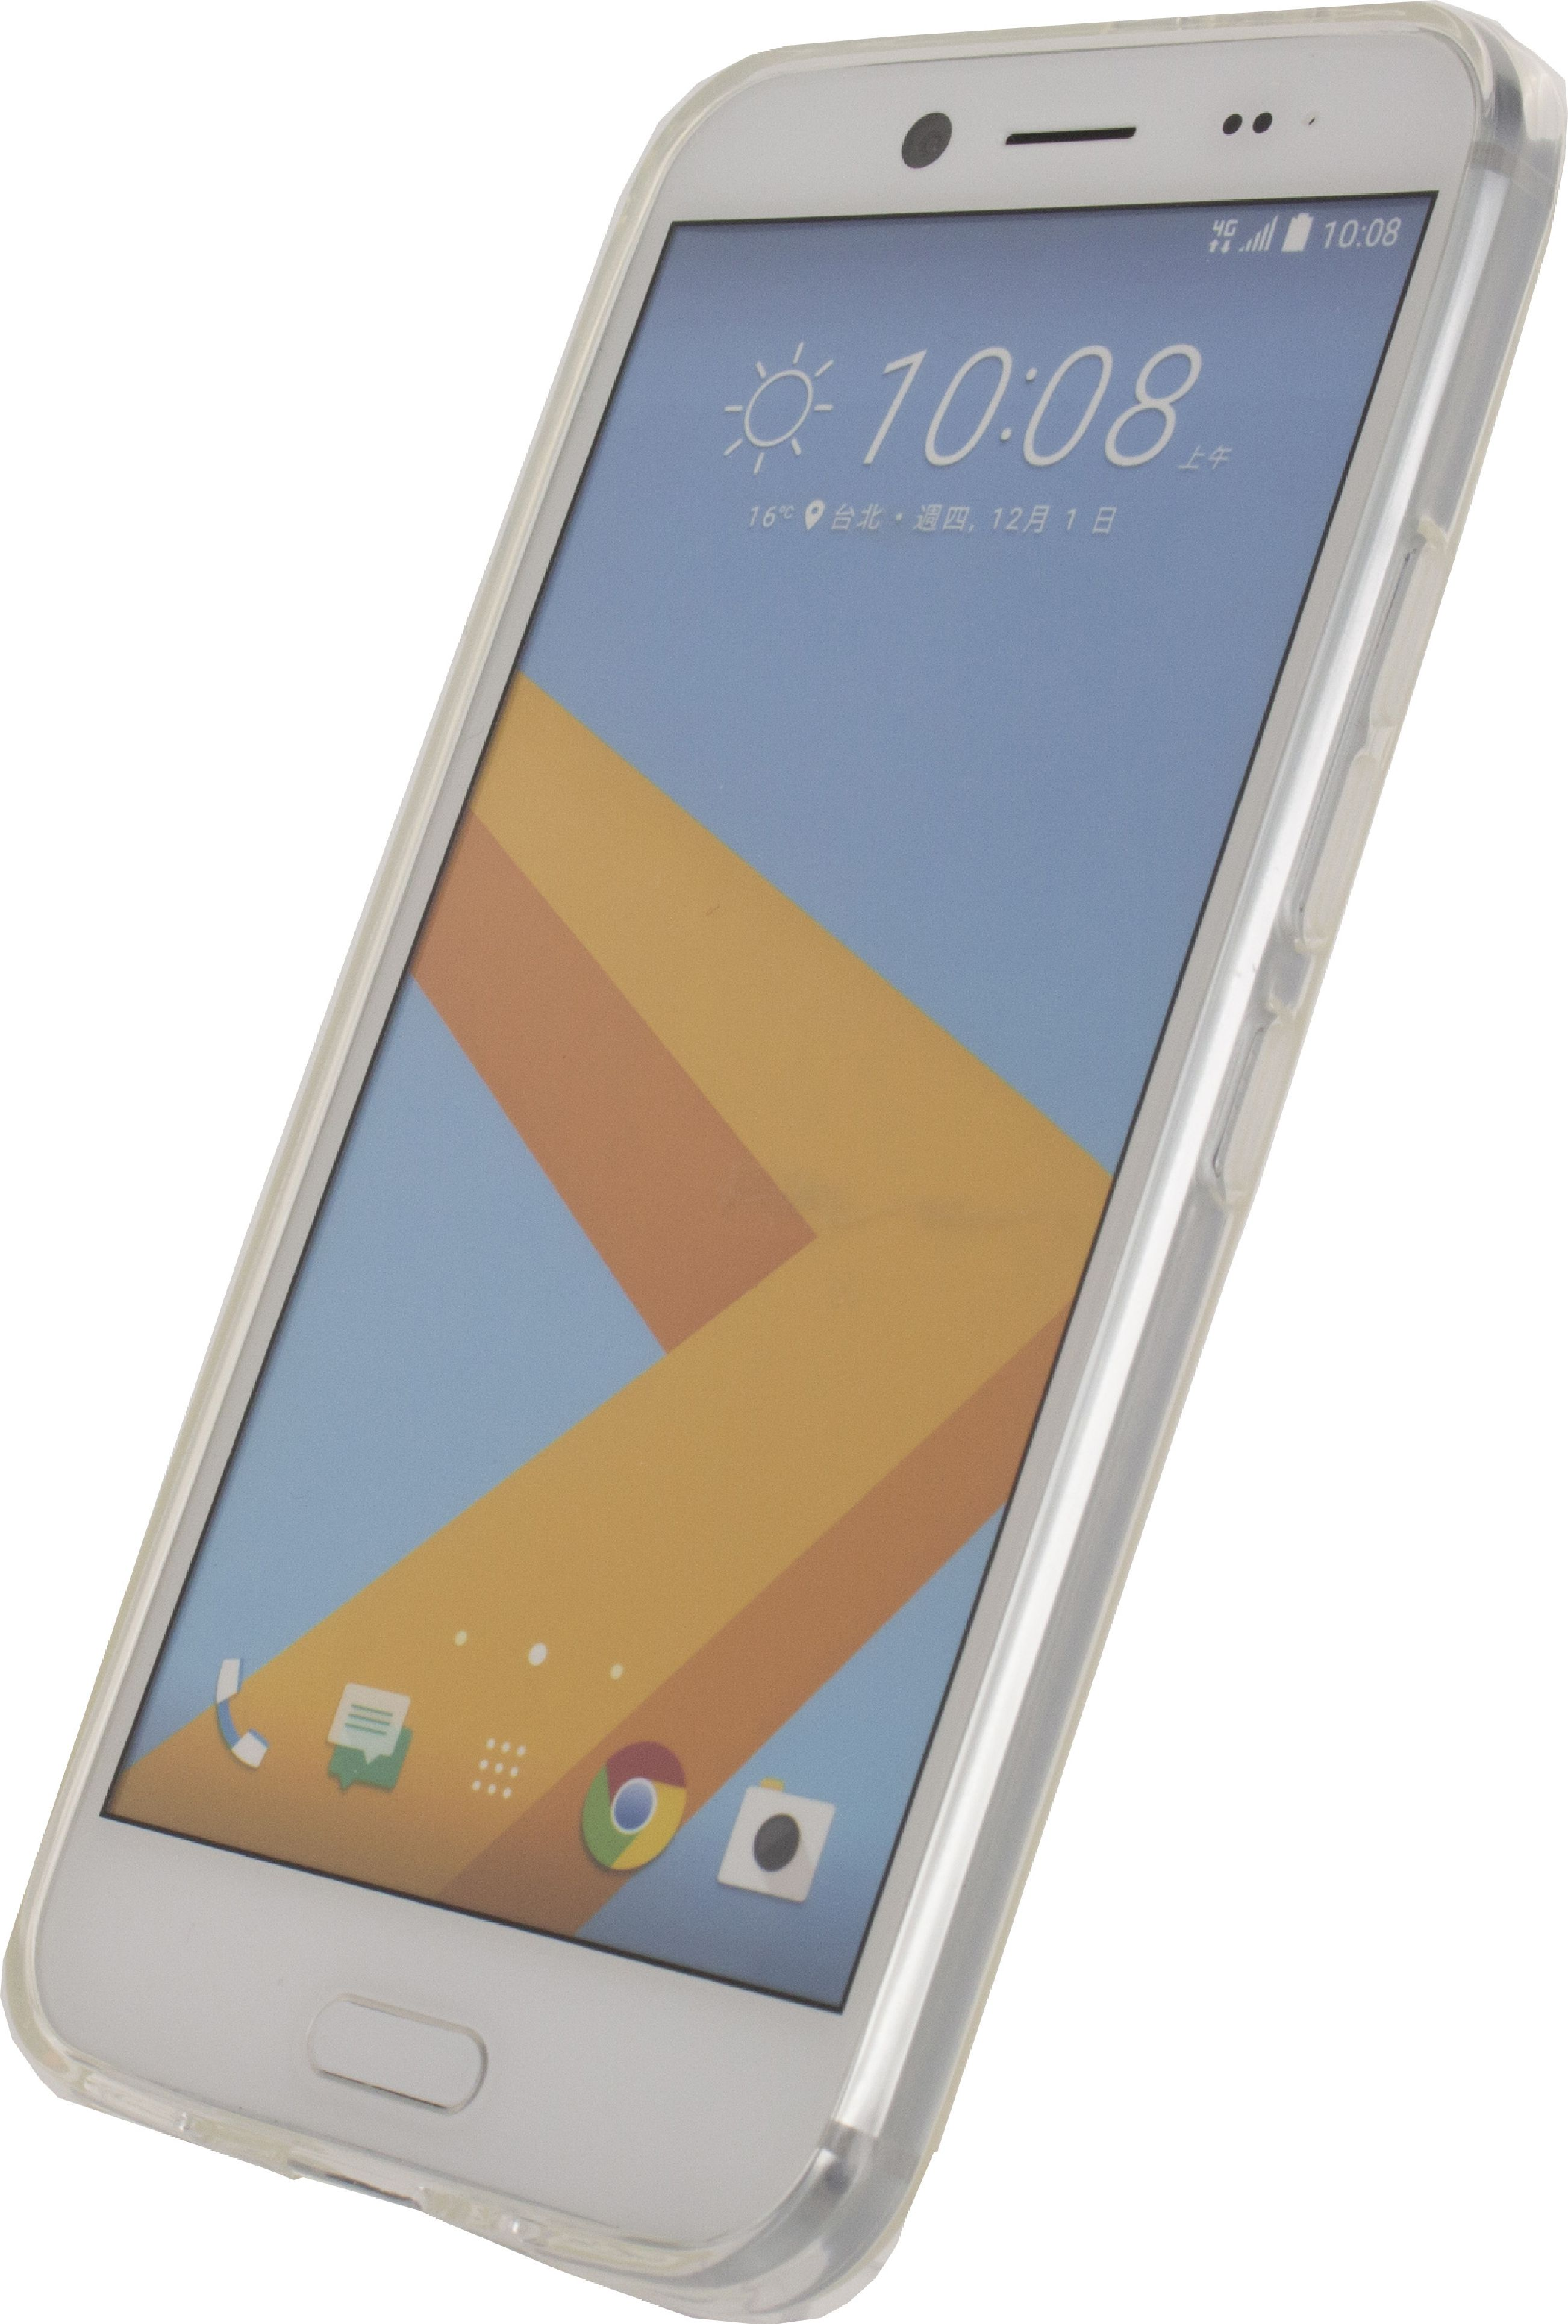 Image of   Telefon Gel-Etui HTC 10 Evo Gennemsigtig